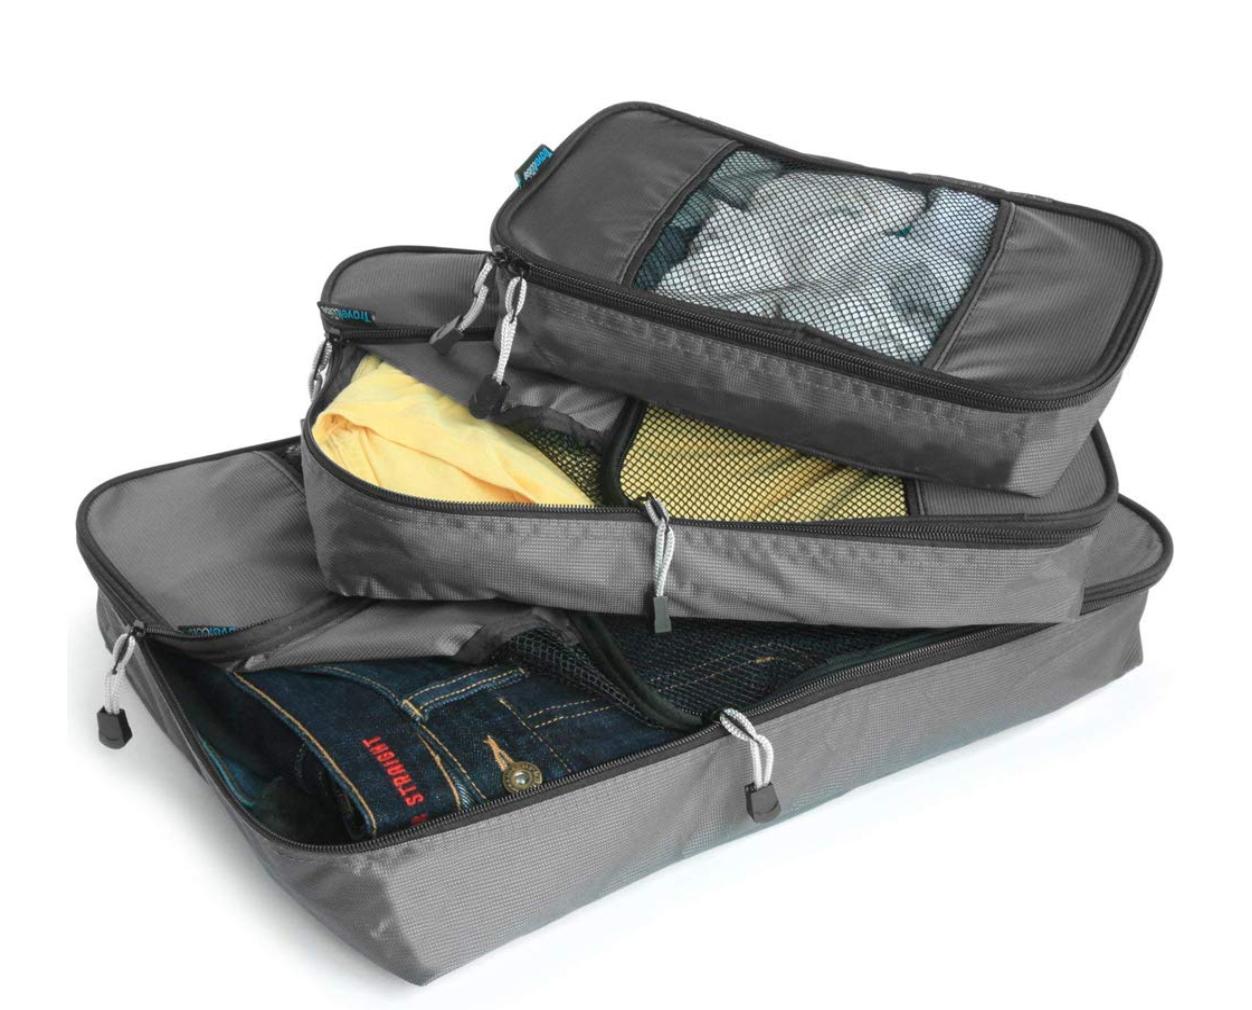 Packing Cubes - Price/Buy